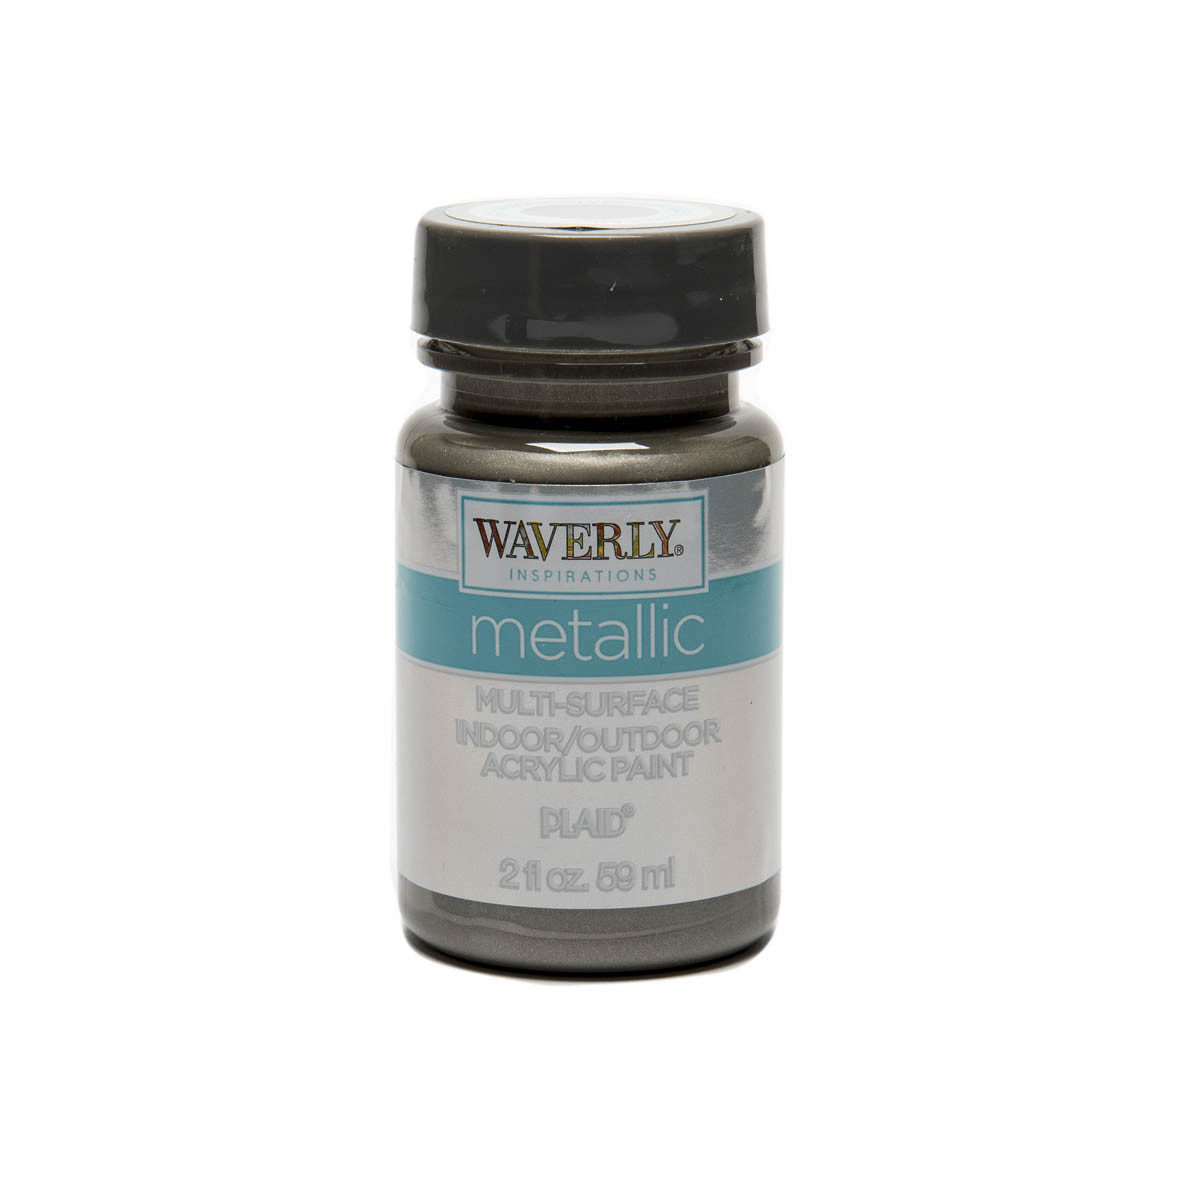 Waverly ® Inspirations Metallic Multi-Surface Acrylic Paint - Antique Silver, 2 oz. - 60926E